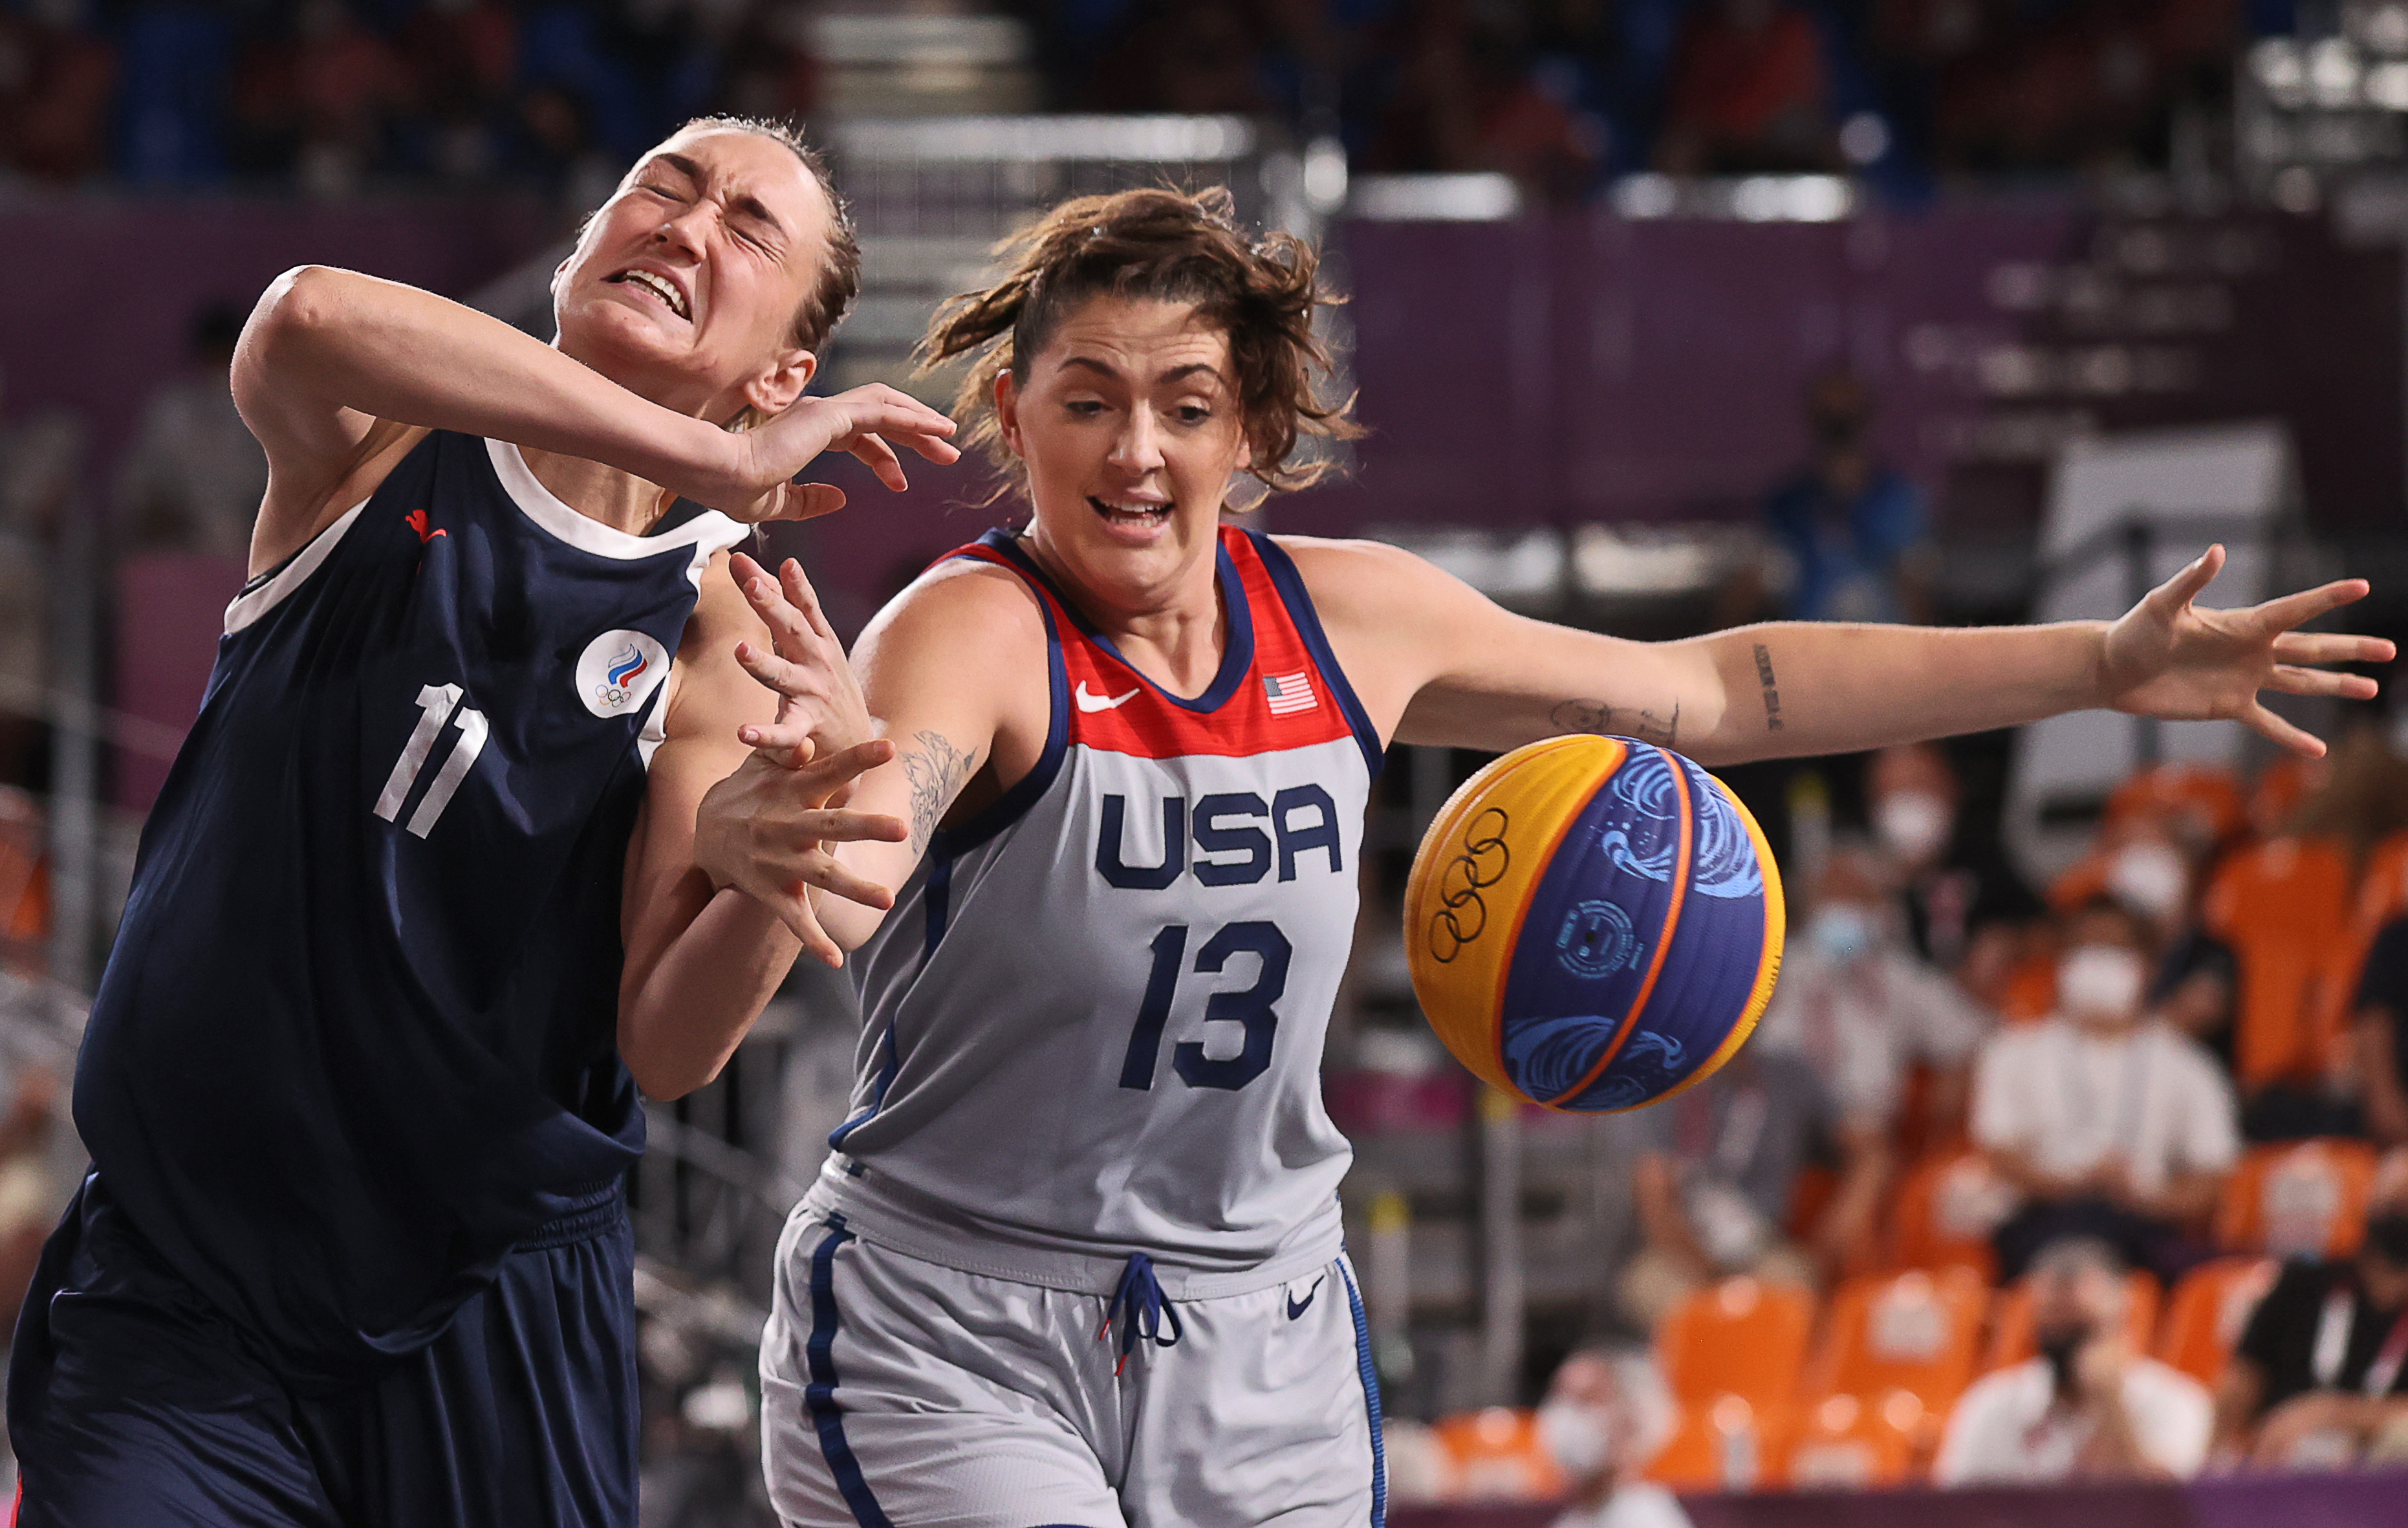 Tokyo 2020 Olympics: Women's 3x3 Basketball Final